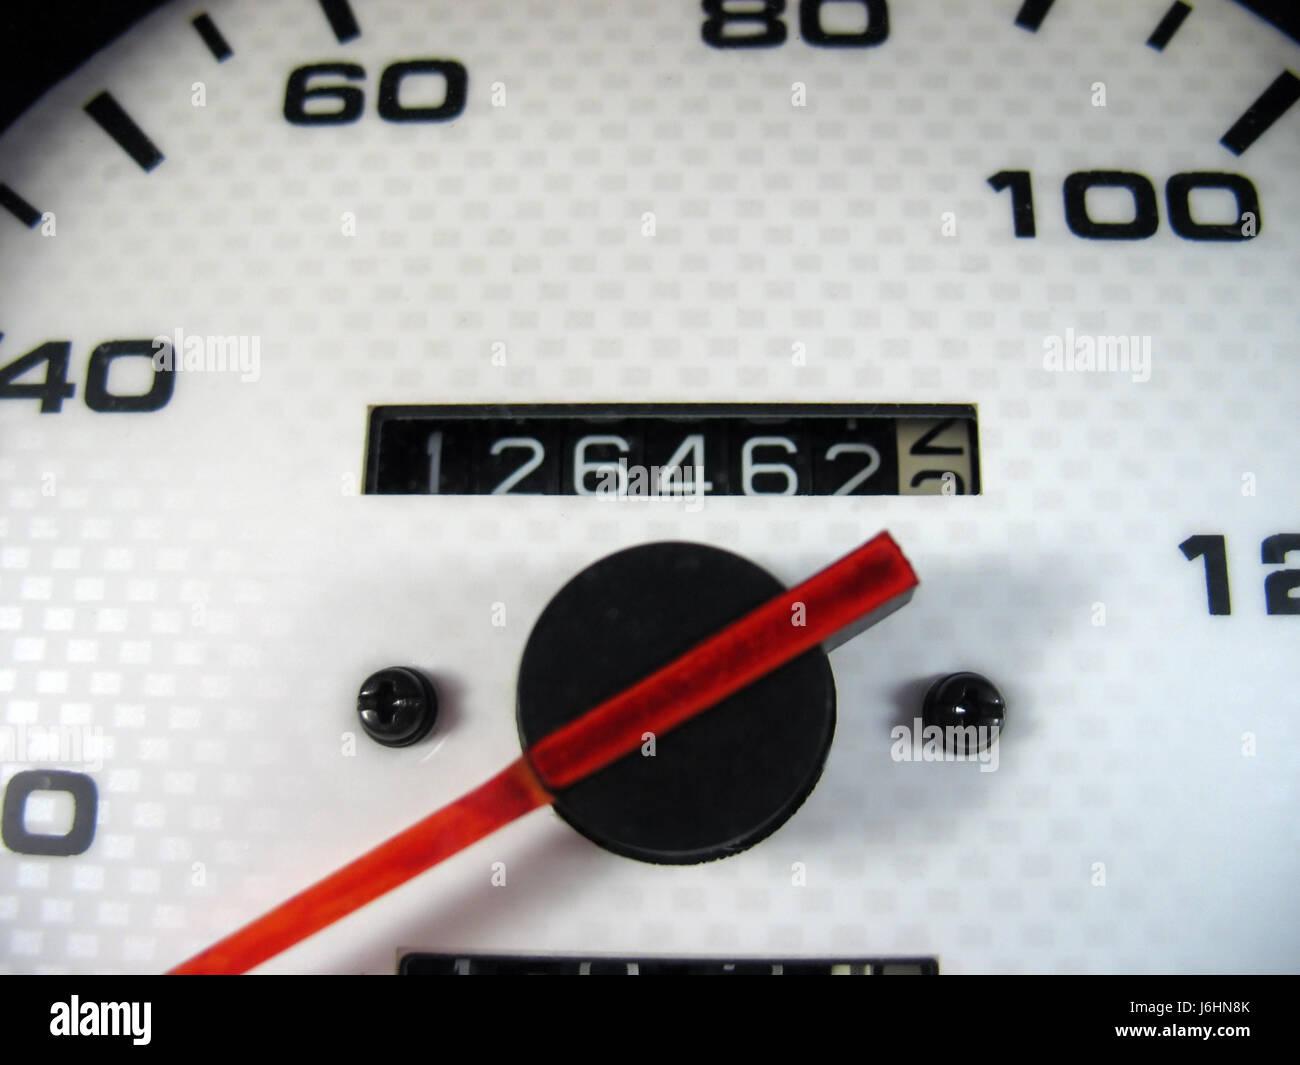 Mileage Dashboard Stock Photos & Mileage Dashboard Stock Images ...